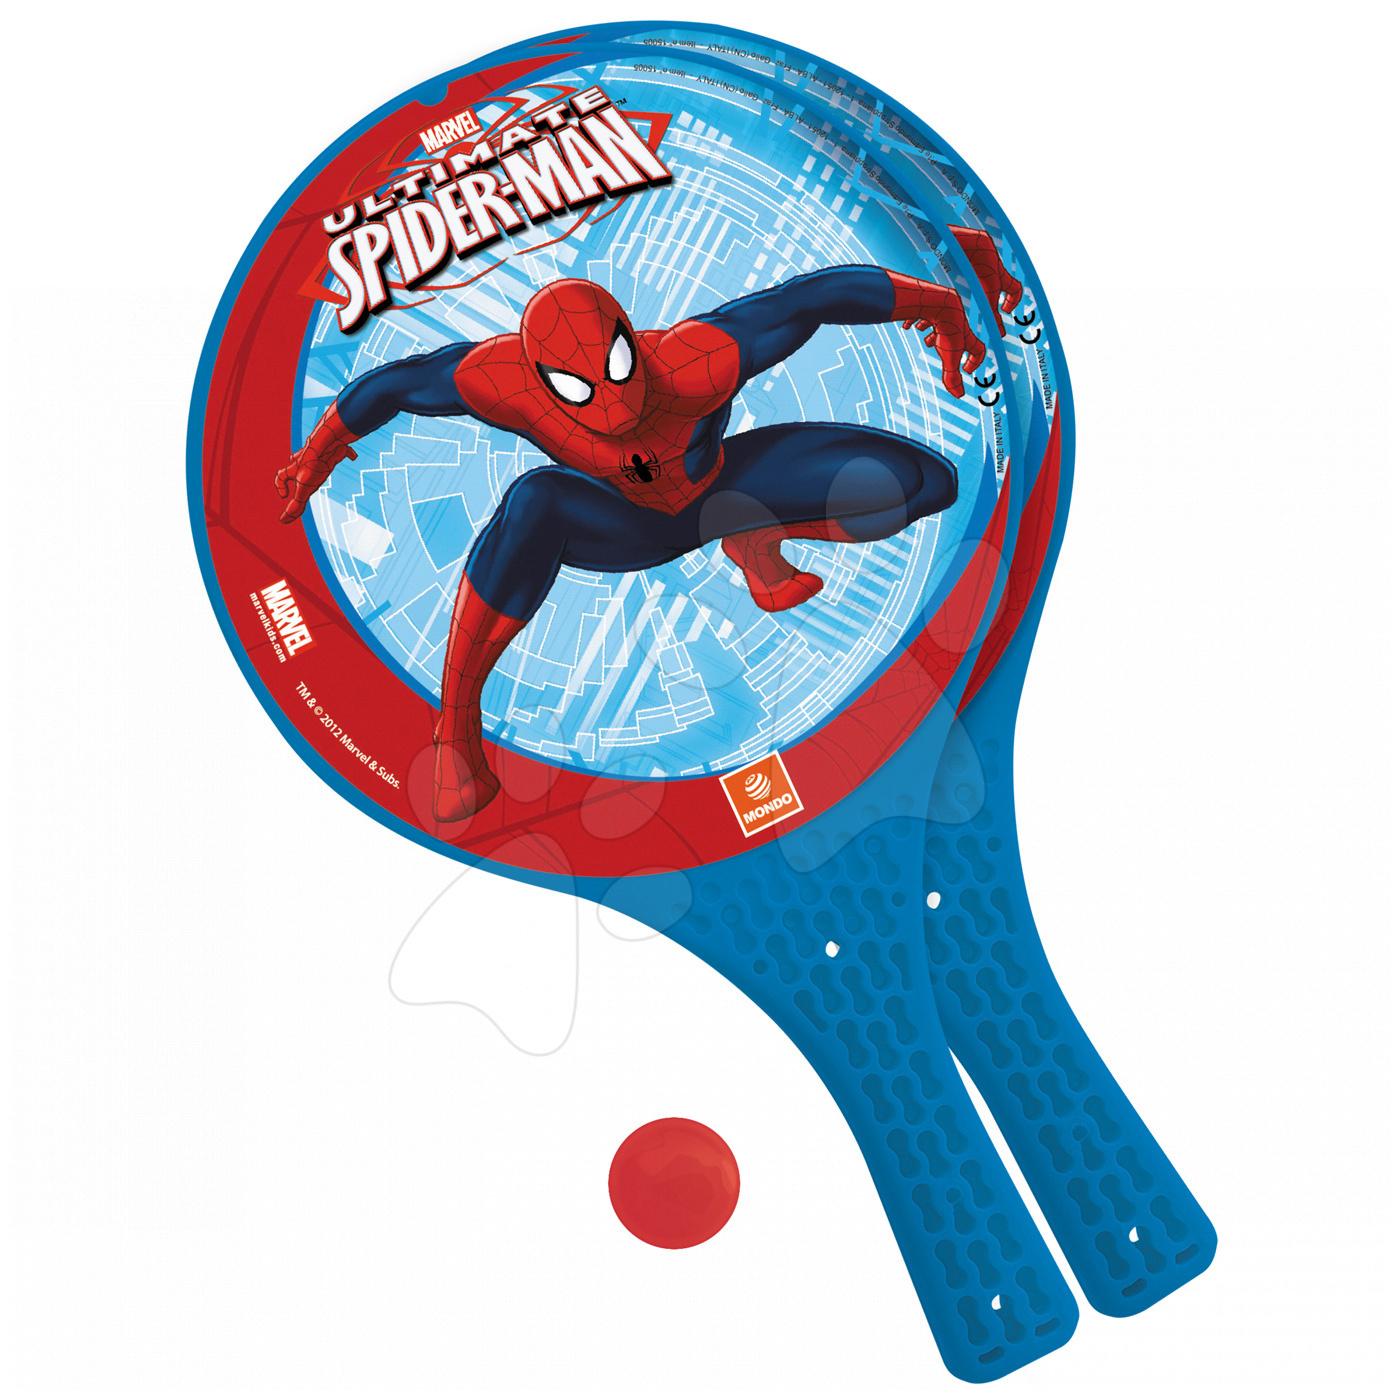 Plážový tenis set The Ultimate Spiderman Mondo s 2 raketami a míčkem